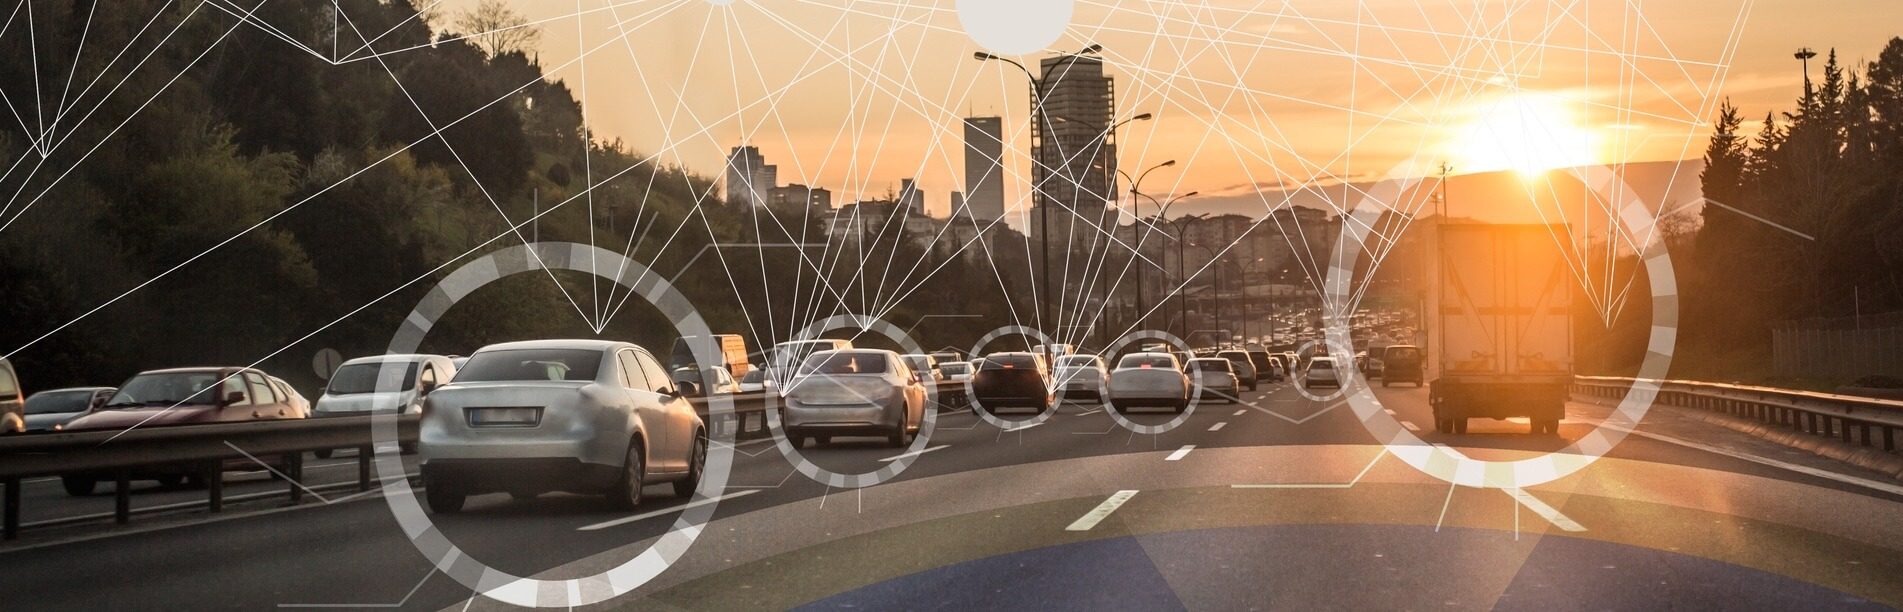 The race to develop autonomous driving: South Korea is planning the world's largest test site K-City